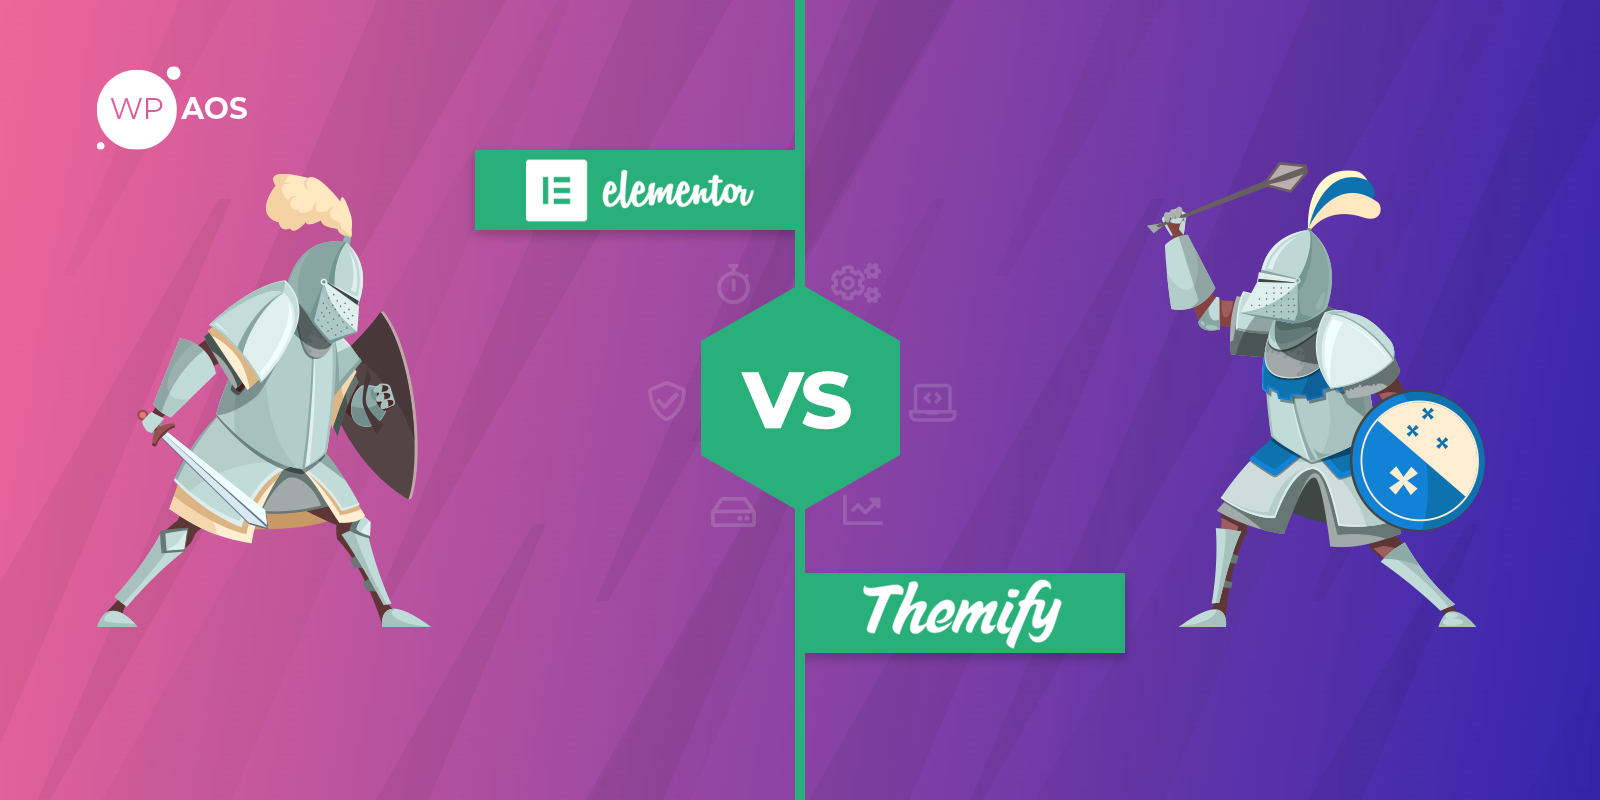 Elementor-VS-Themify